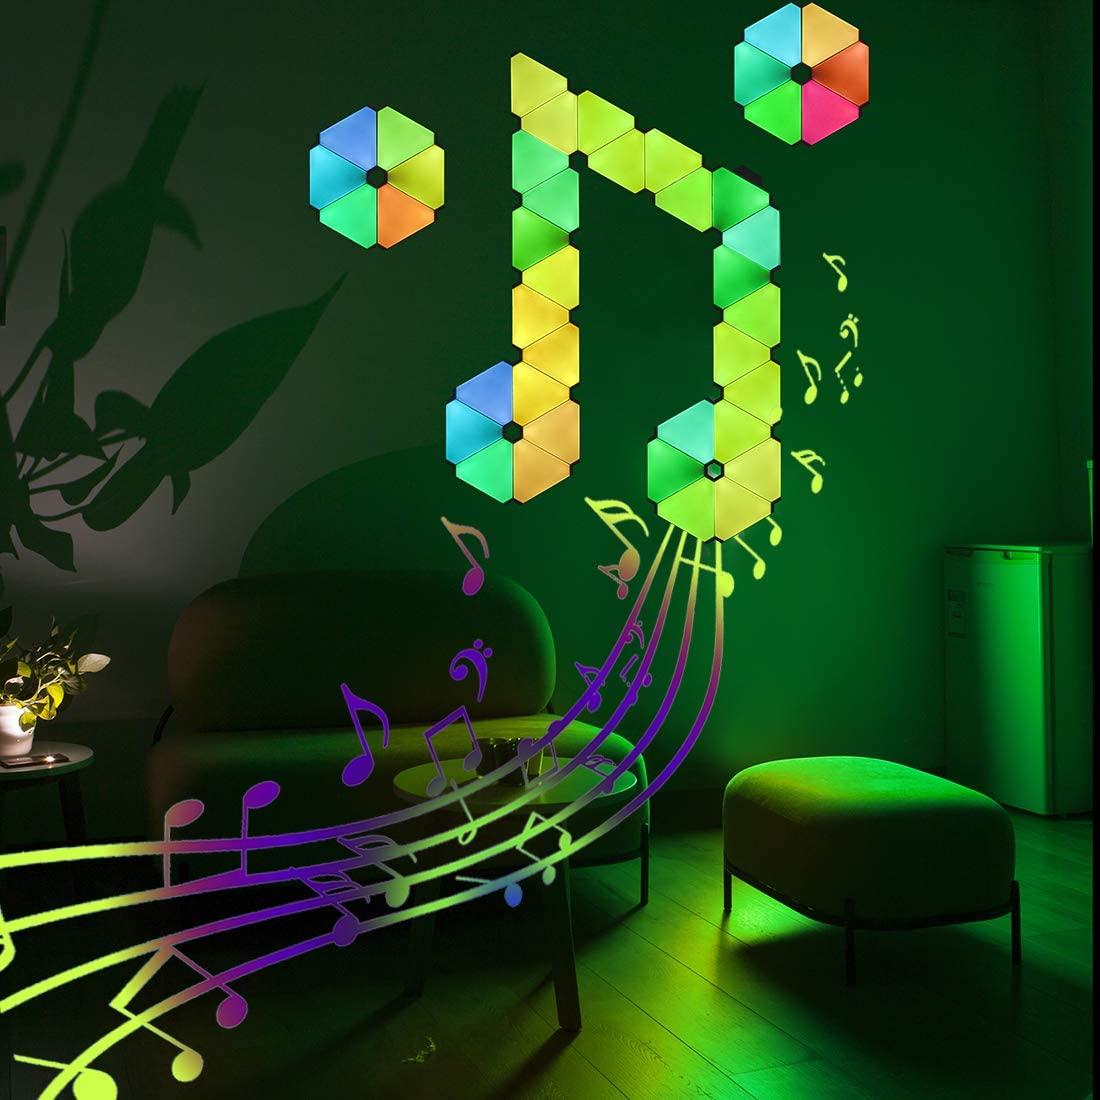 Smart Wall LED Light Gaming Light Panels Panels Touch-Sensitive Night Lights DIY Geometry Splicing Quantum Light Room Decor